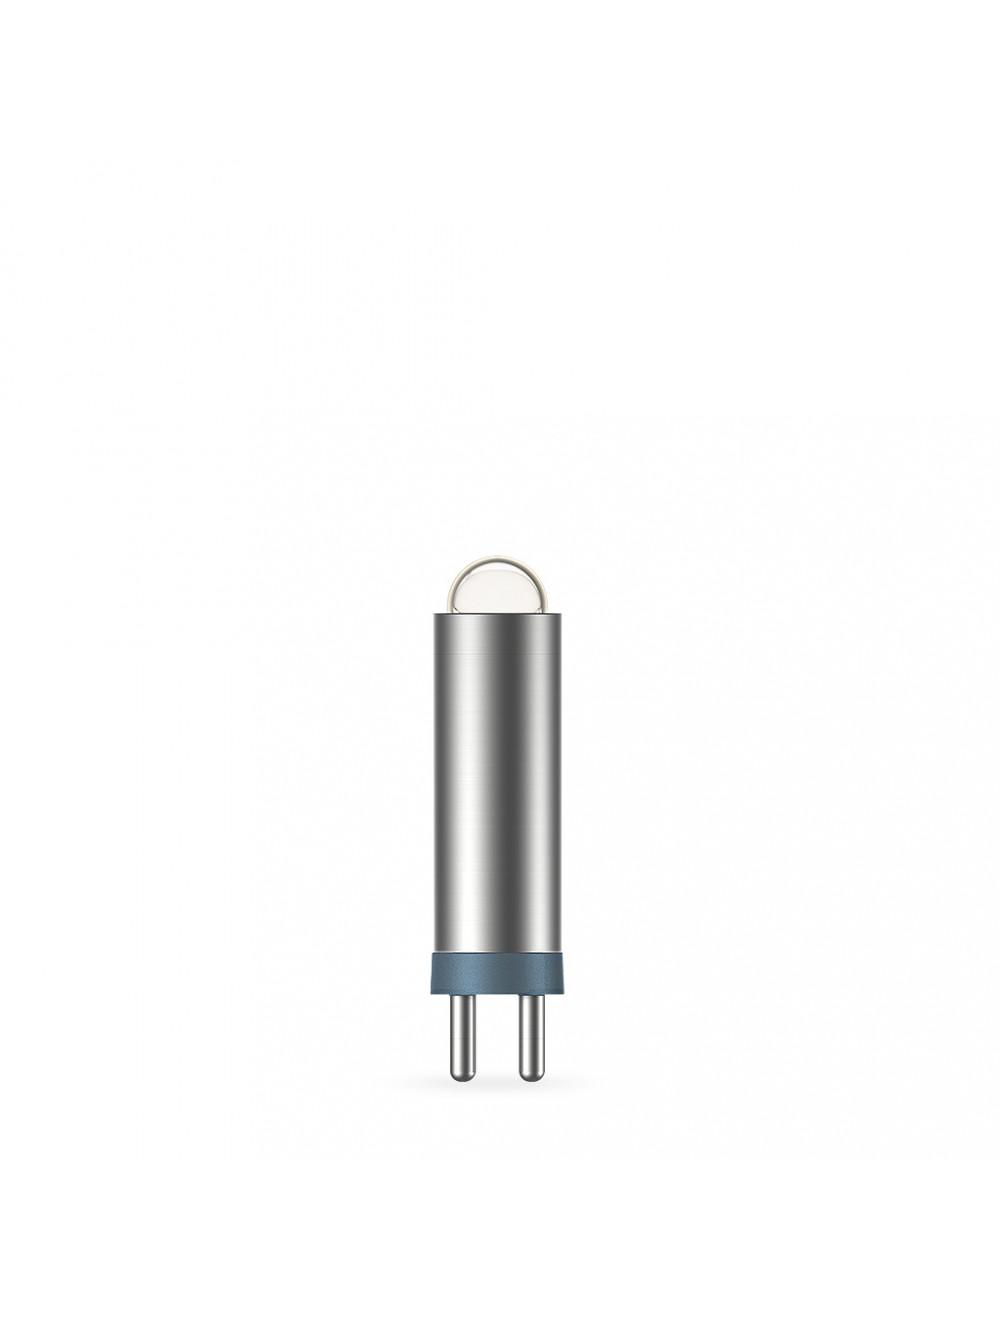 Das Produkt MK-dent Xenon Lampe BU7012N aus dem Global-dent online shop.